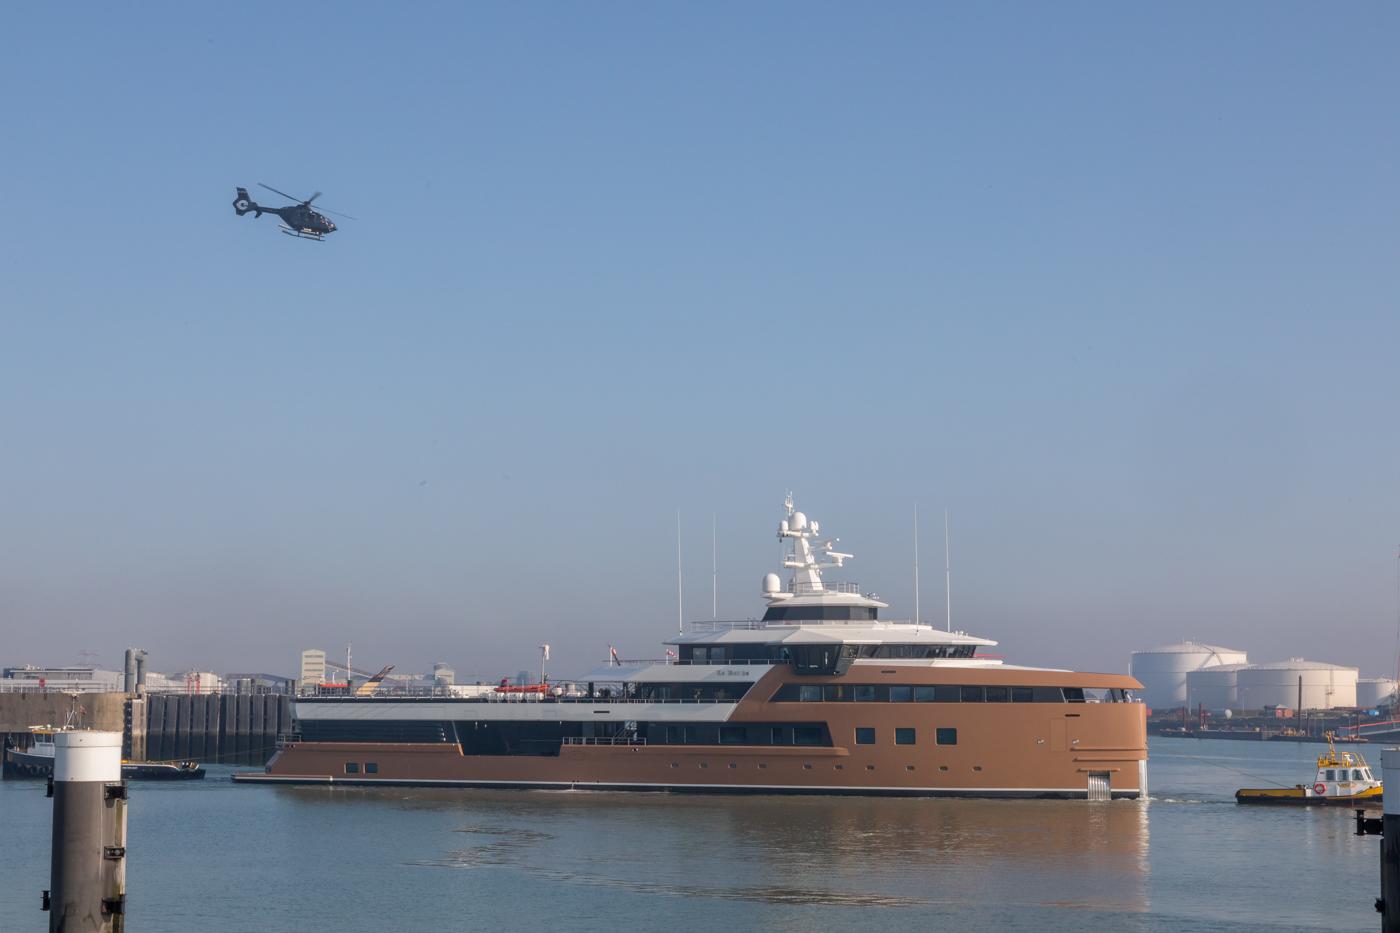 Yacht-La-Datcha-77-Heliski-Russia-4